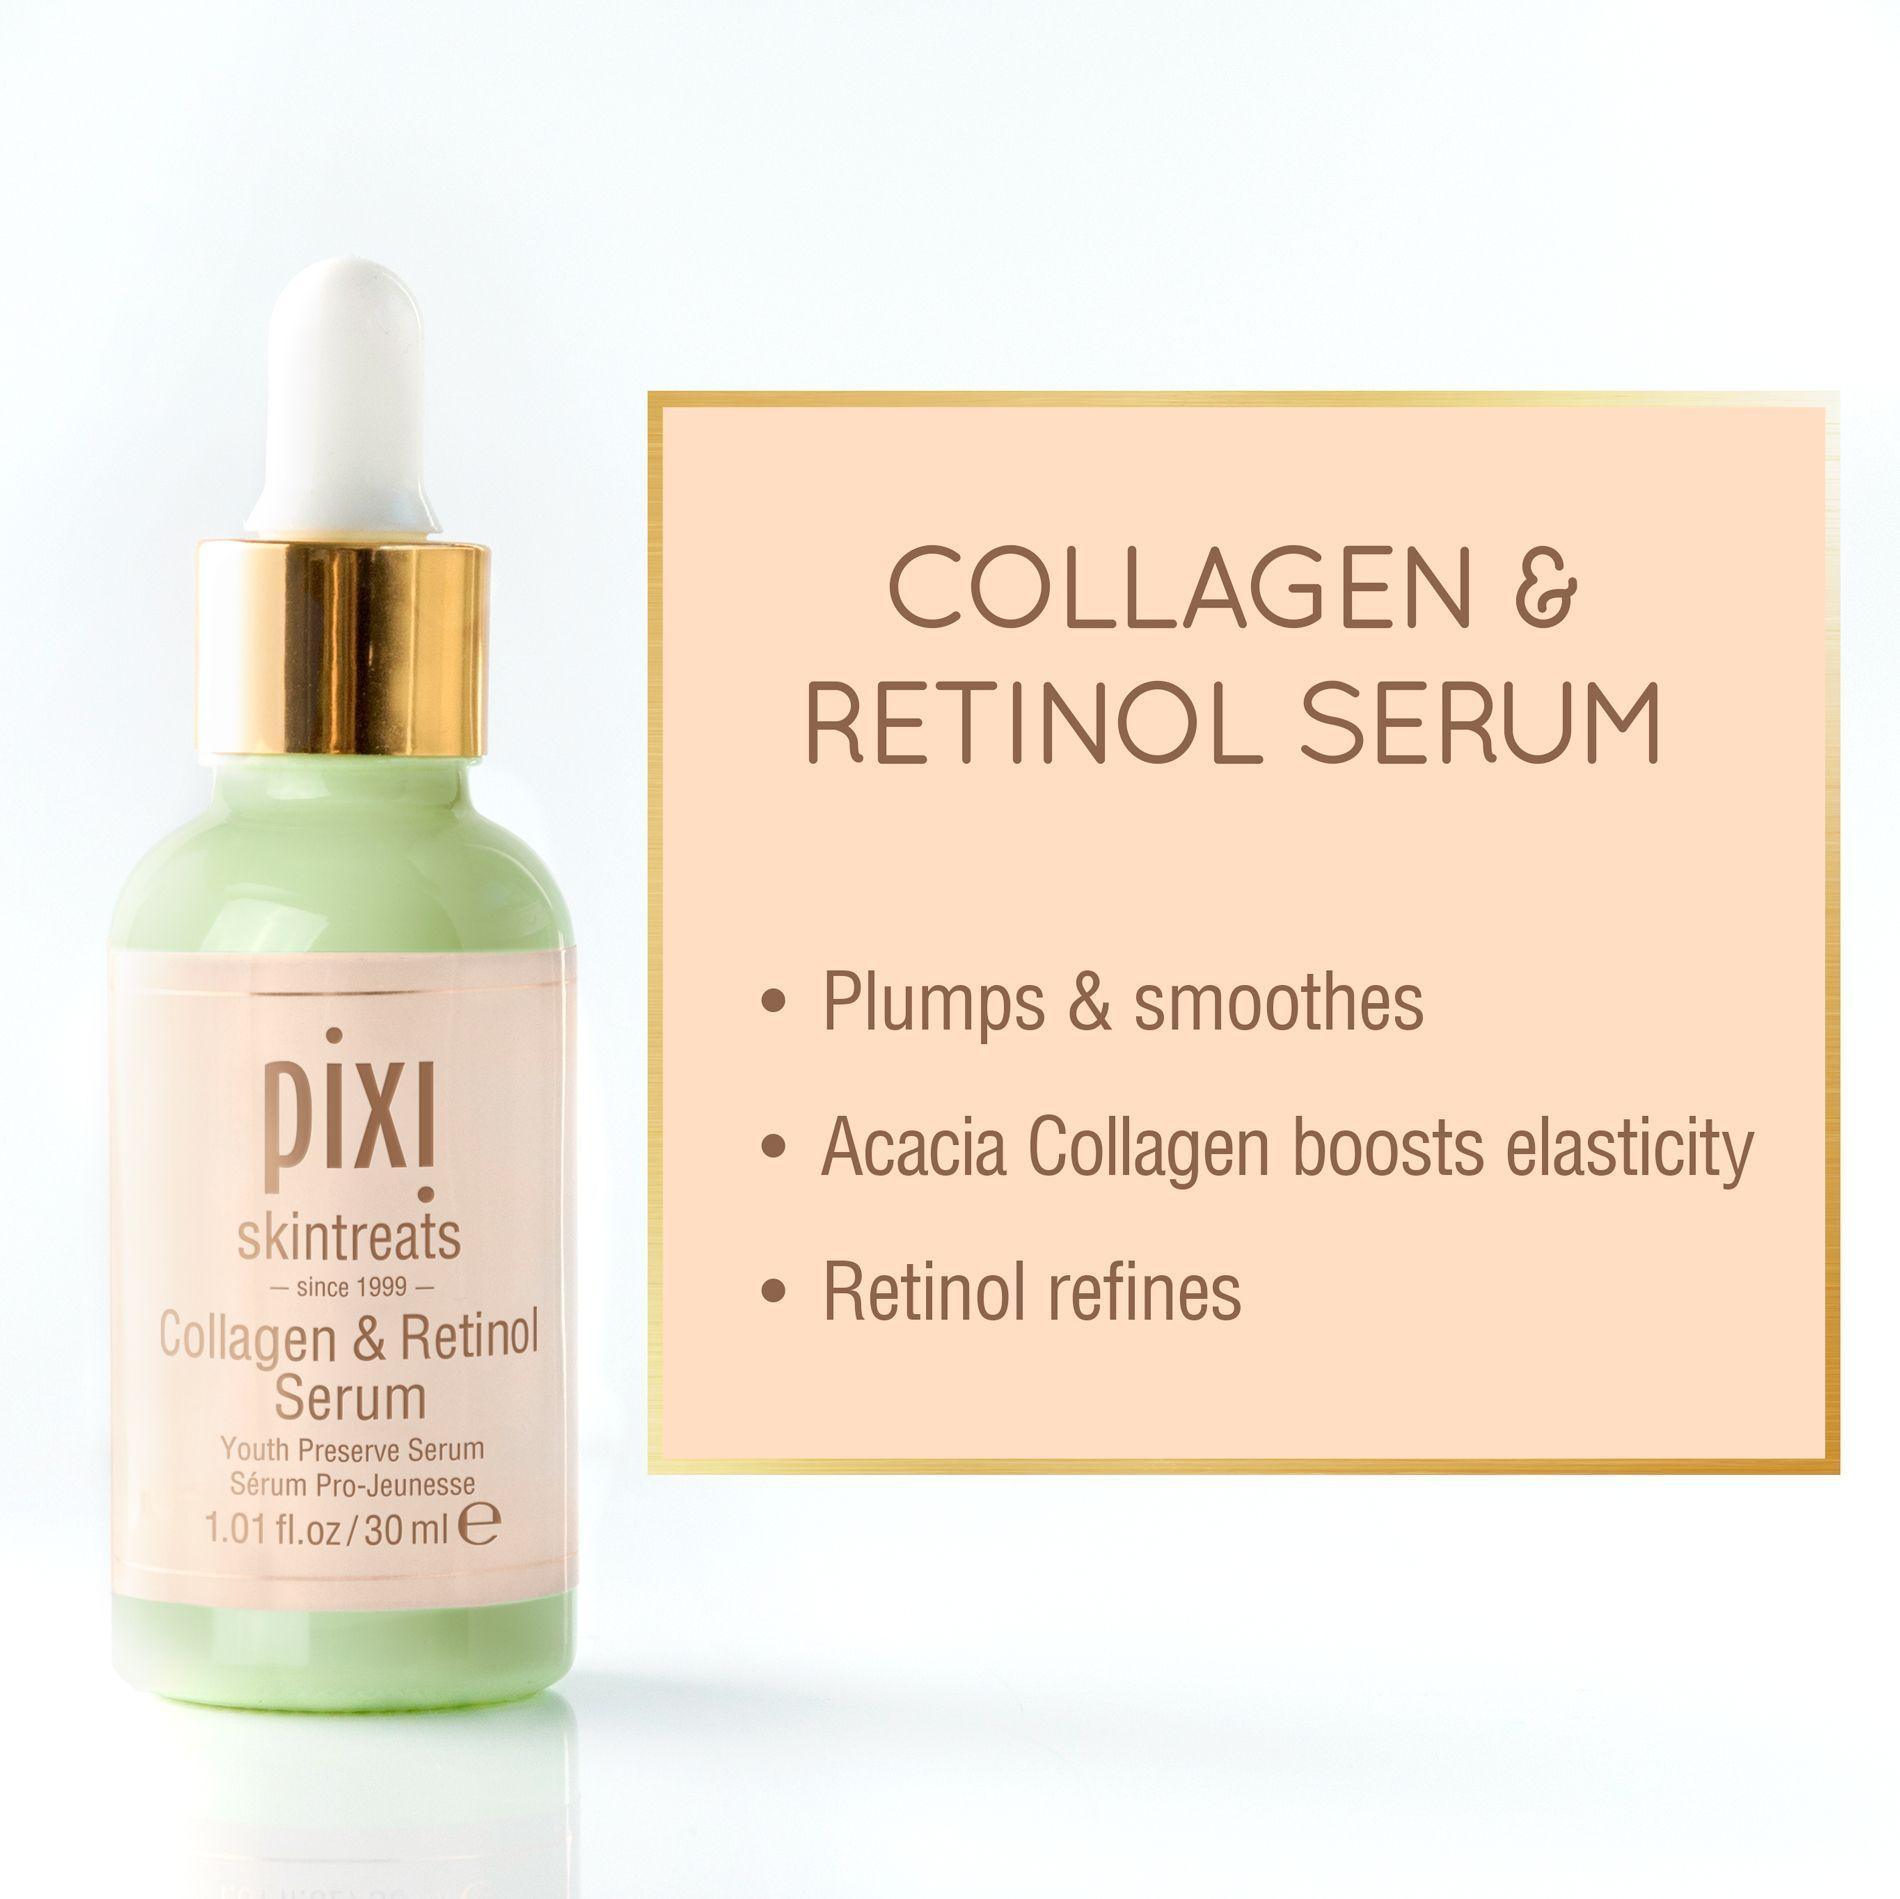 Collagen Retinol Serum Retinol Serum Body Skin Condition And Treatment Retinol